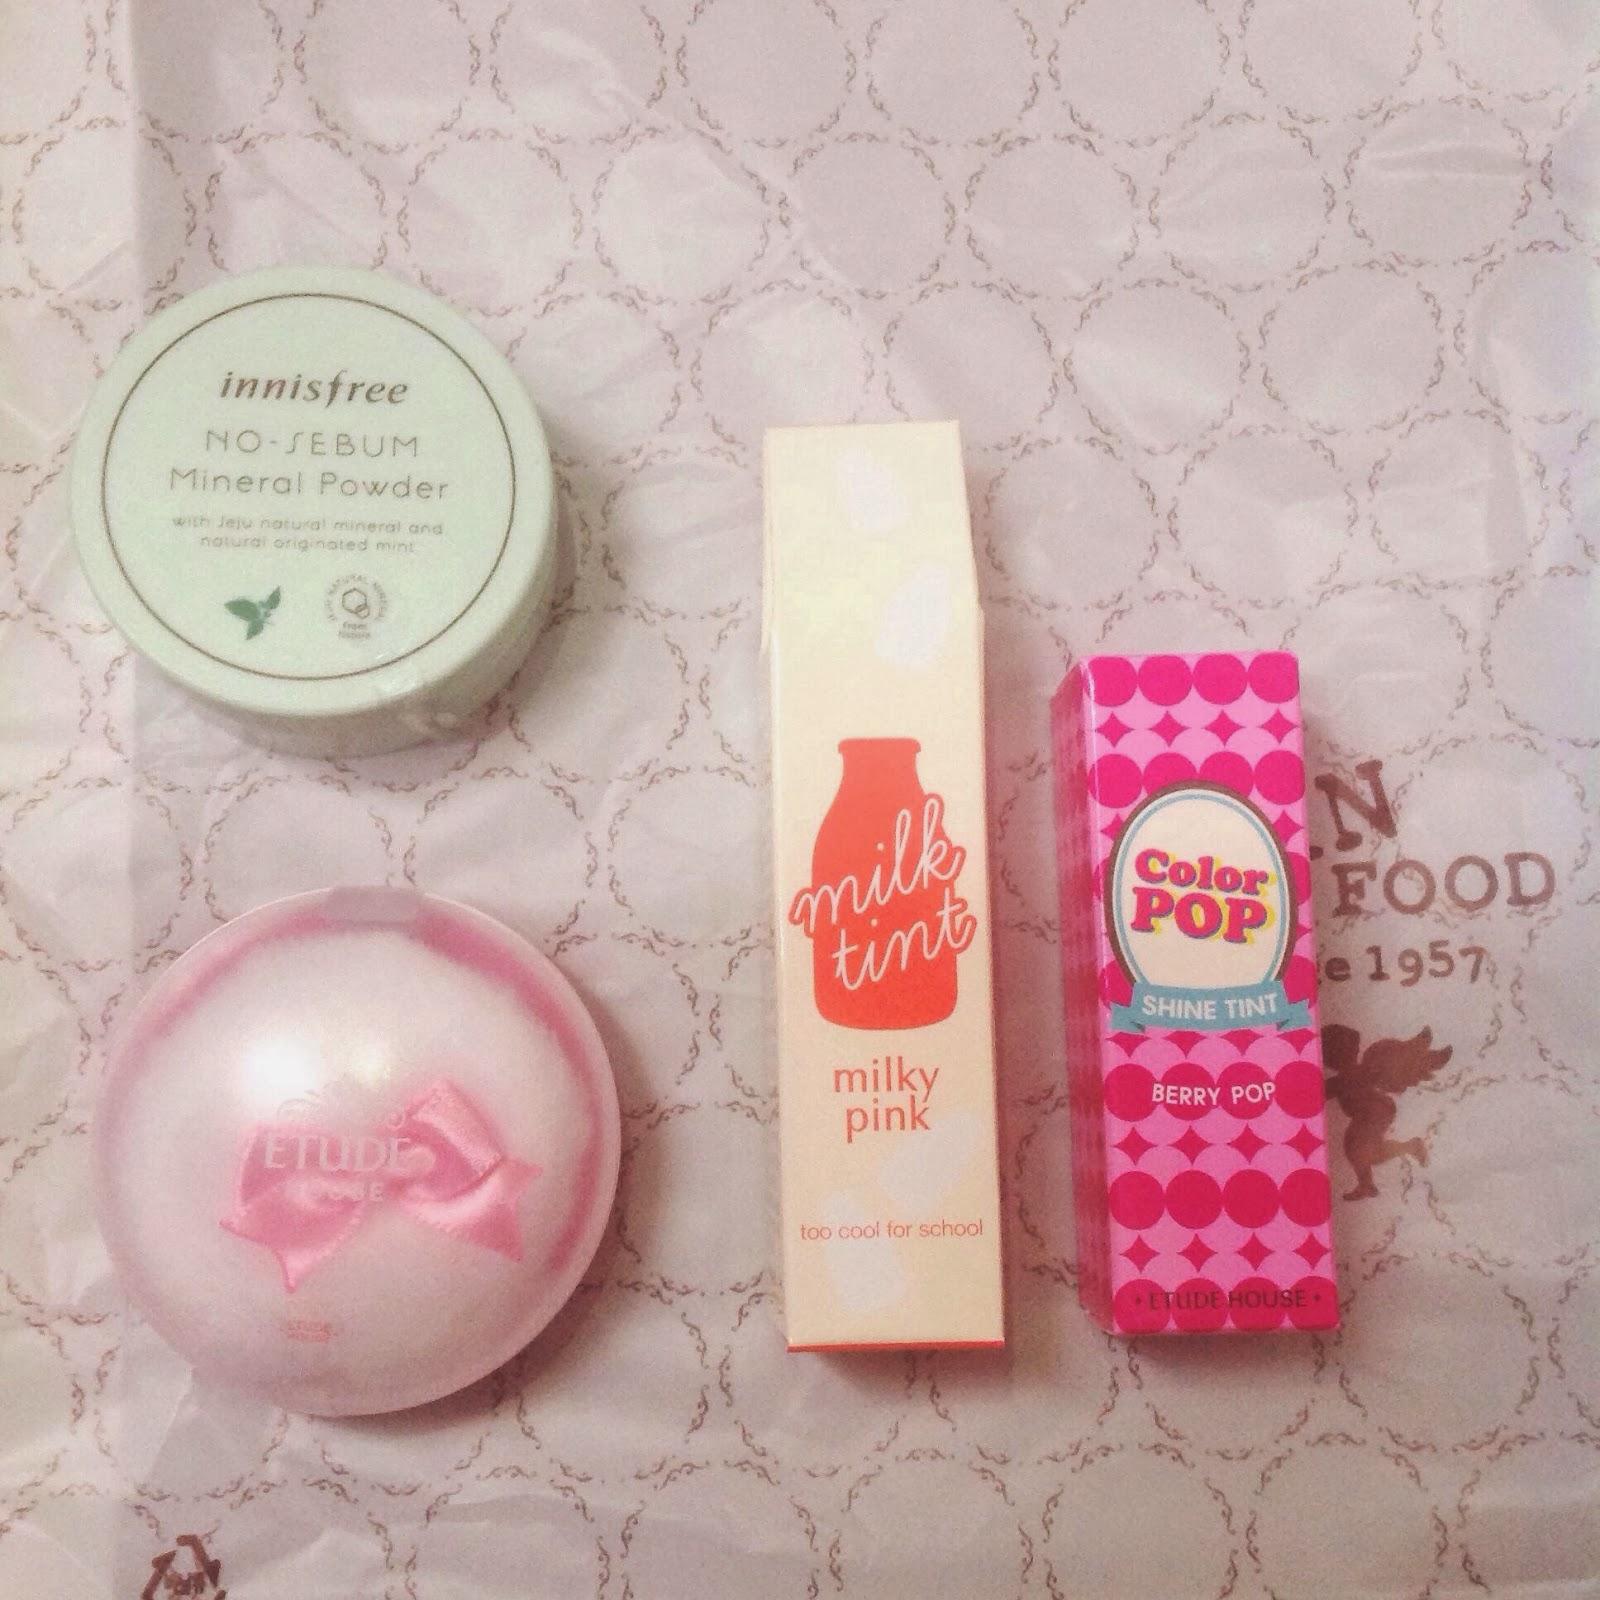 innisfree cosmetics sydney - photo#10